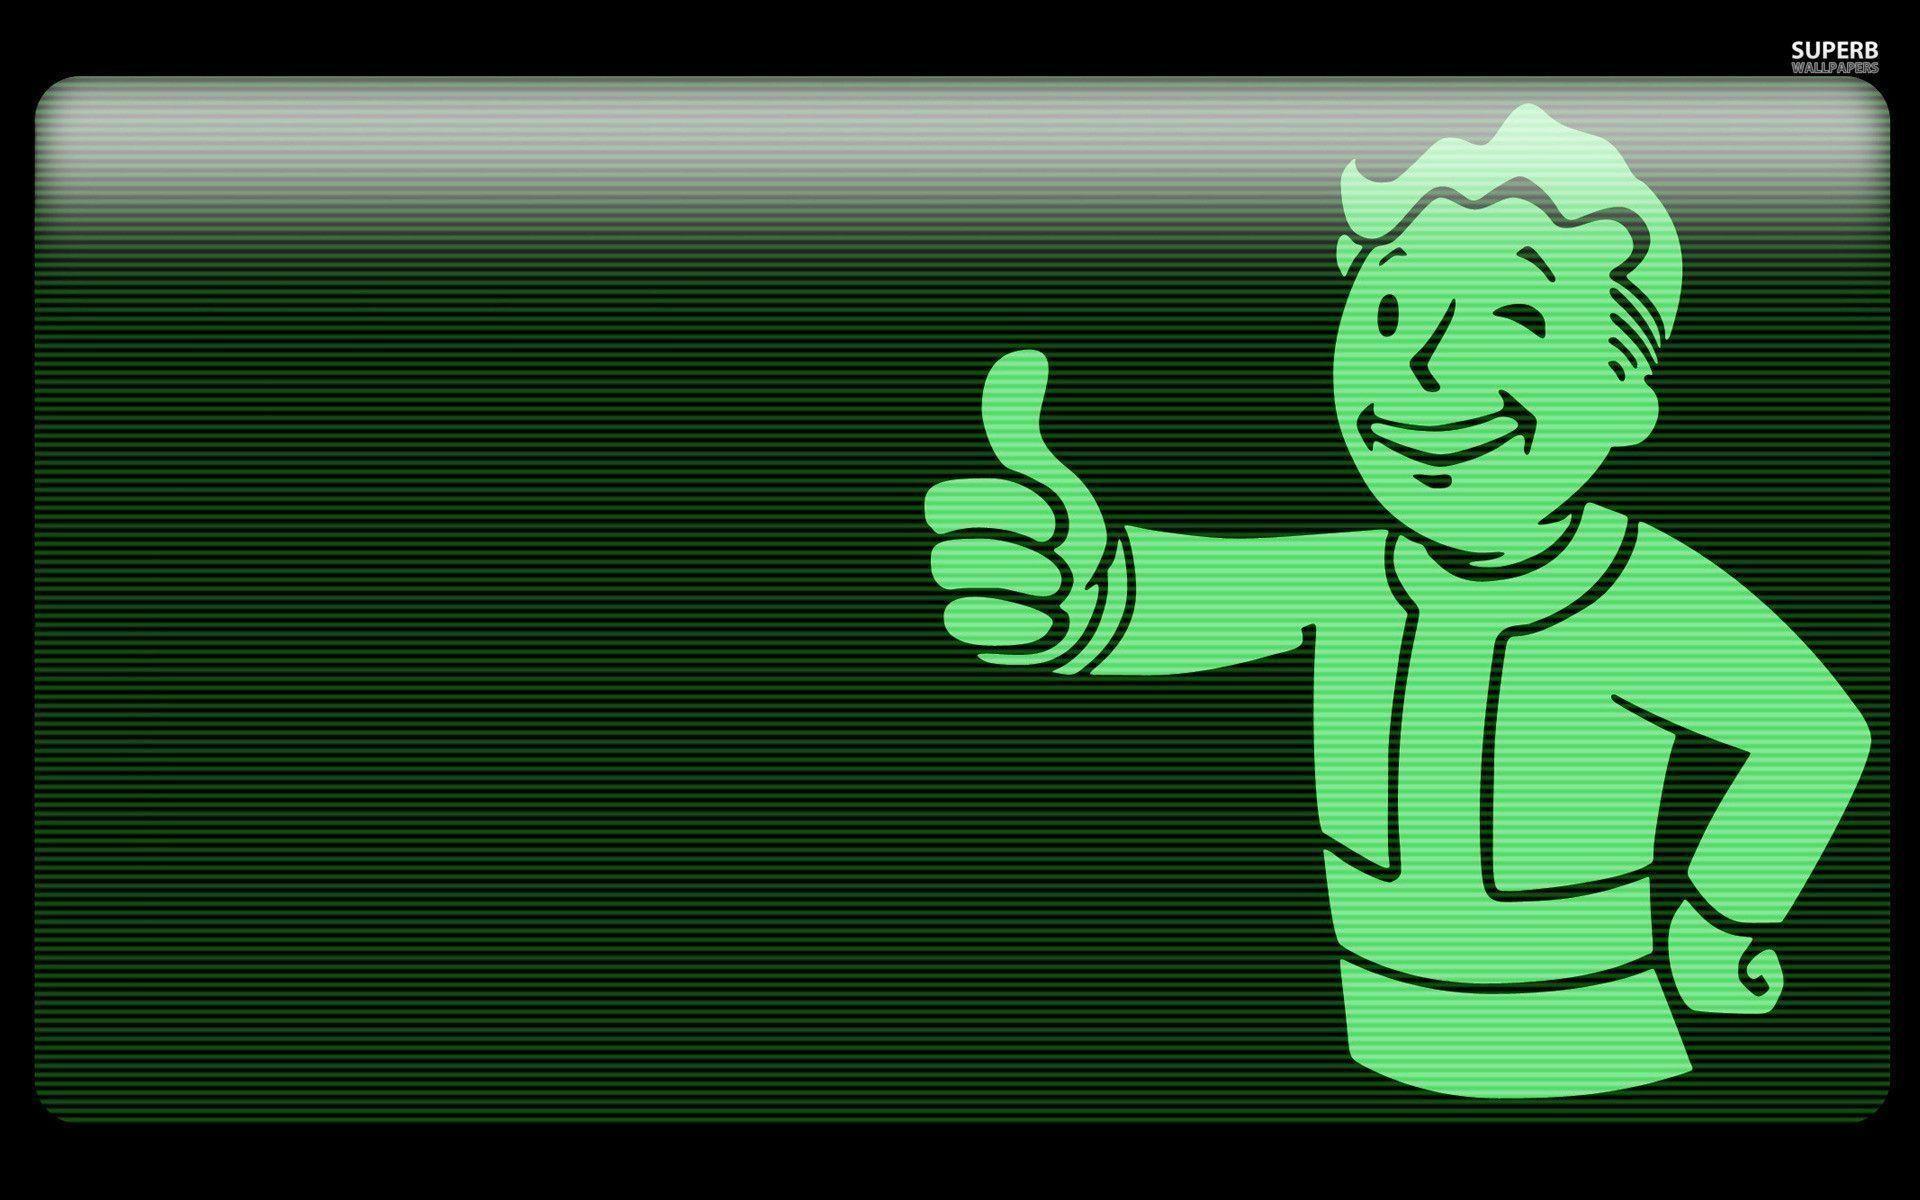 Fall Out Boy Wallpaper Ipad Fallout Pip Boy Wallpaper Hd 76 Images